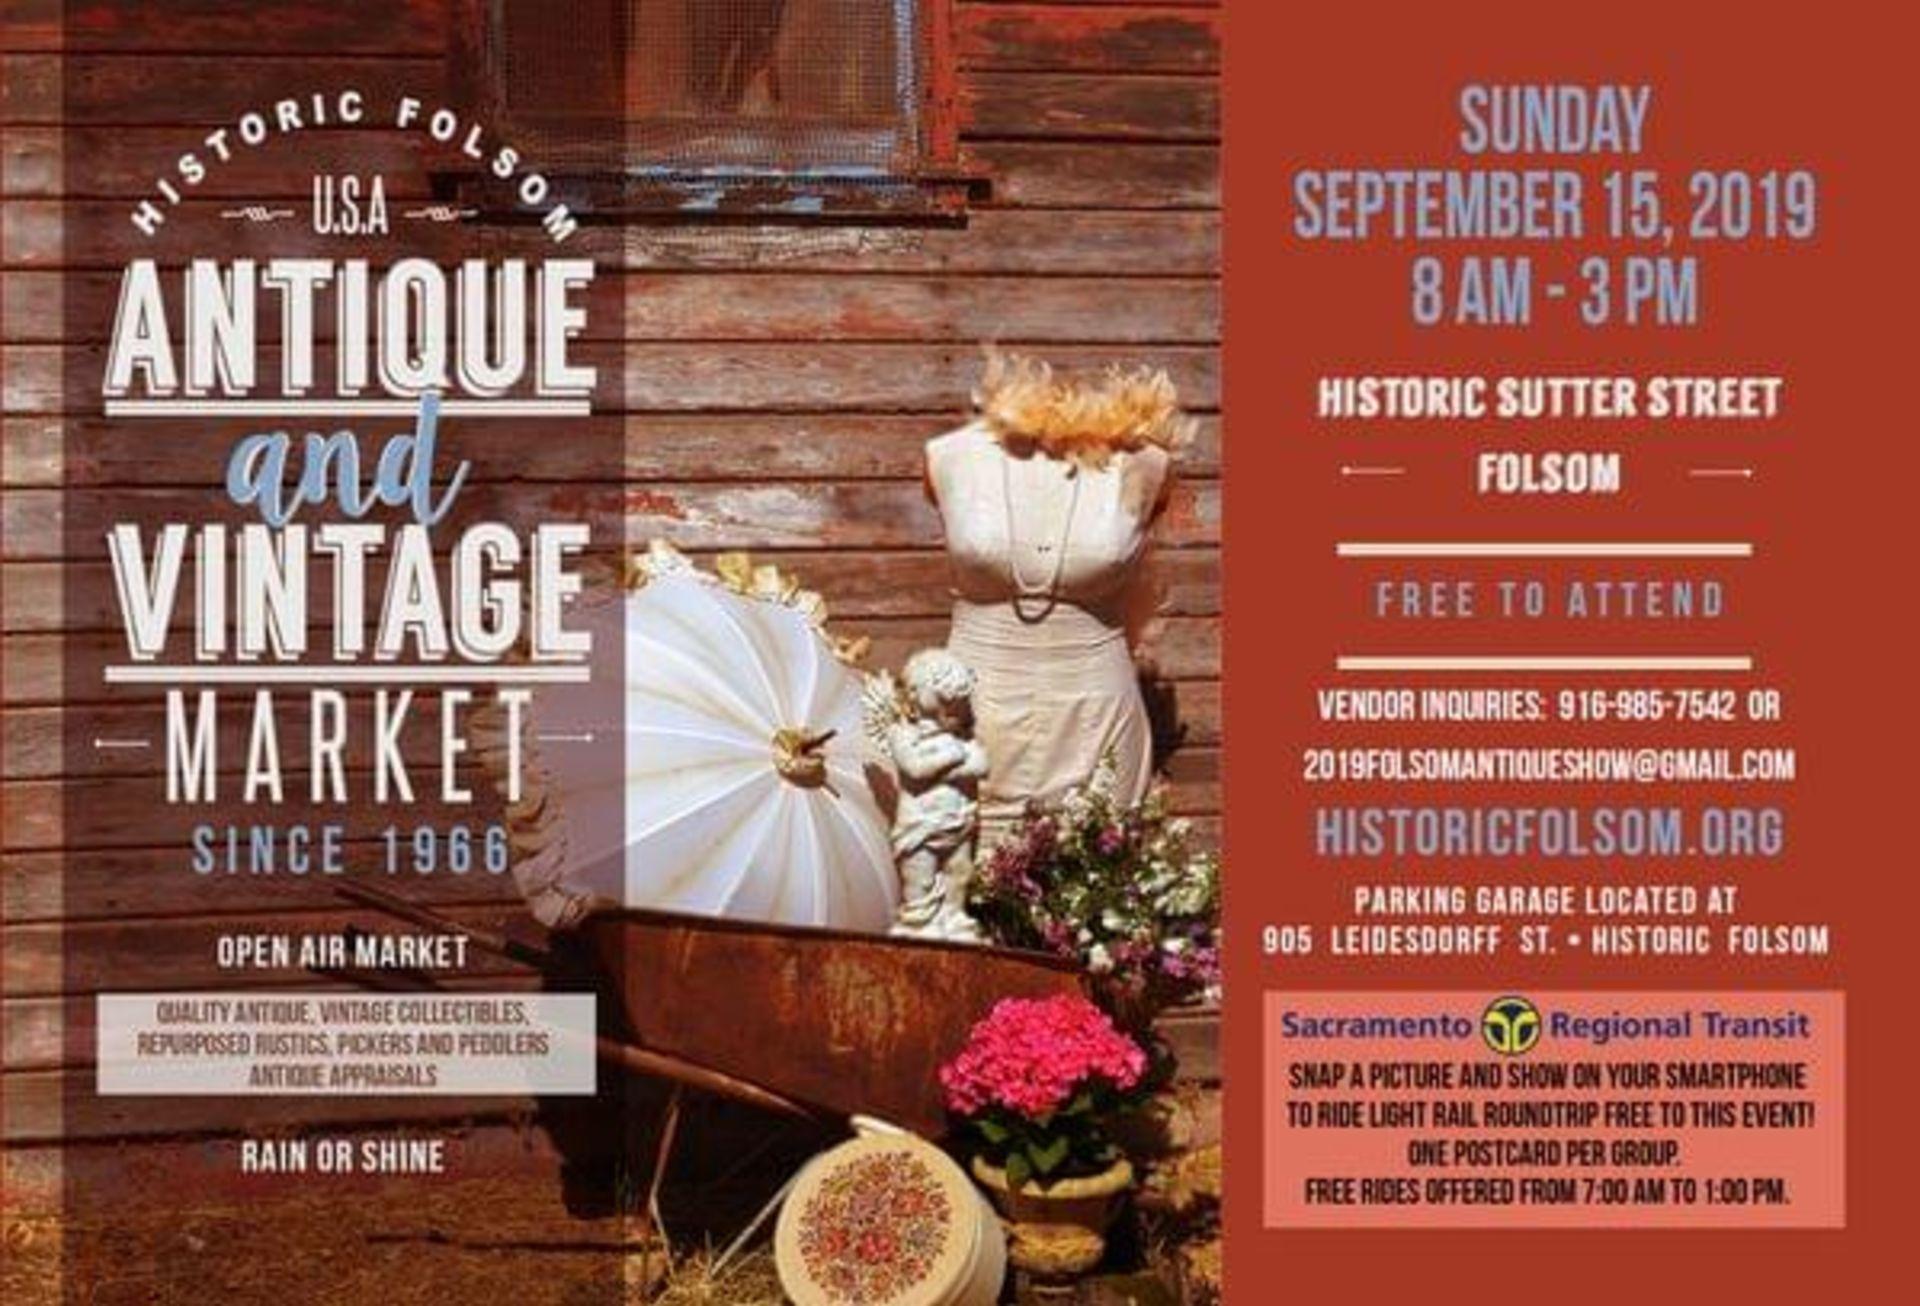 Folsom Antique and Vintage Fair Market